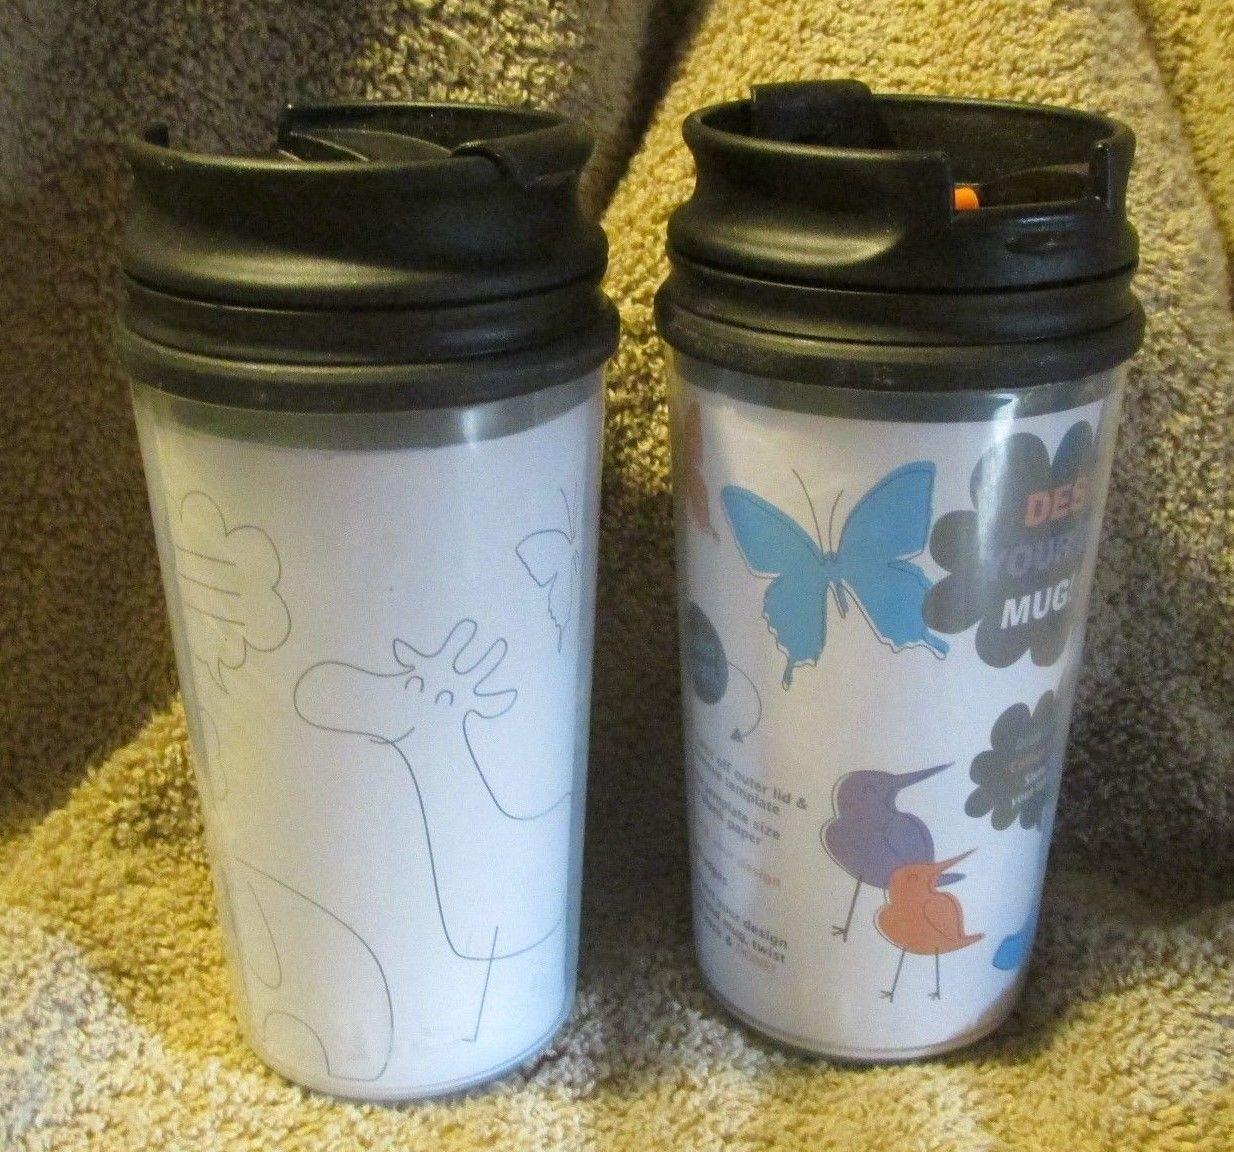 Design Your Own Mug 11 Oz Travel Mug Greenbrier Intl